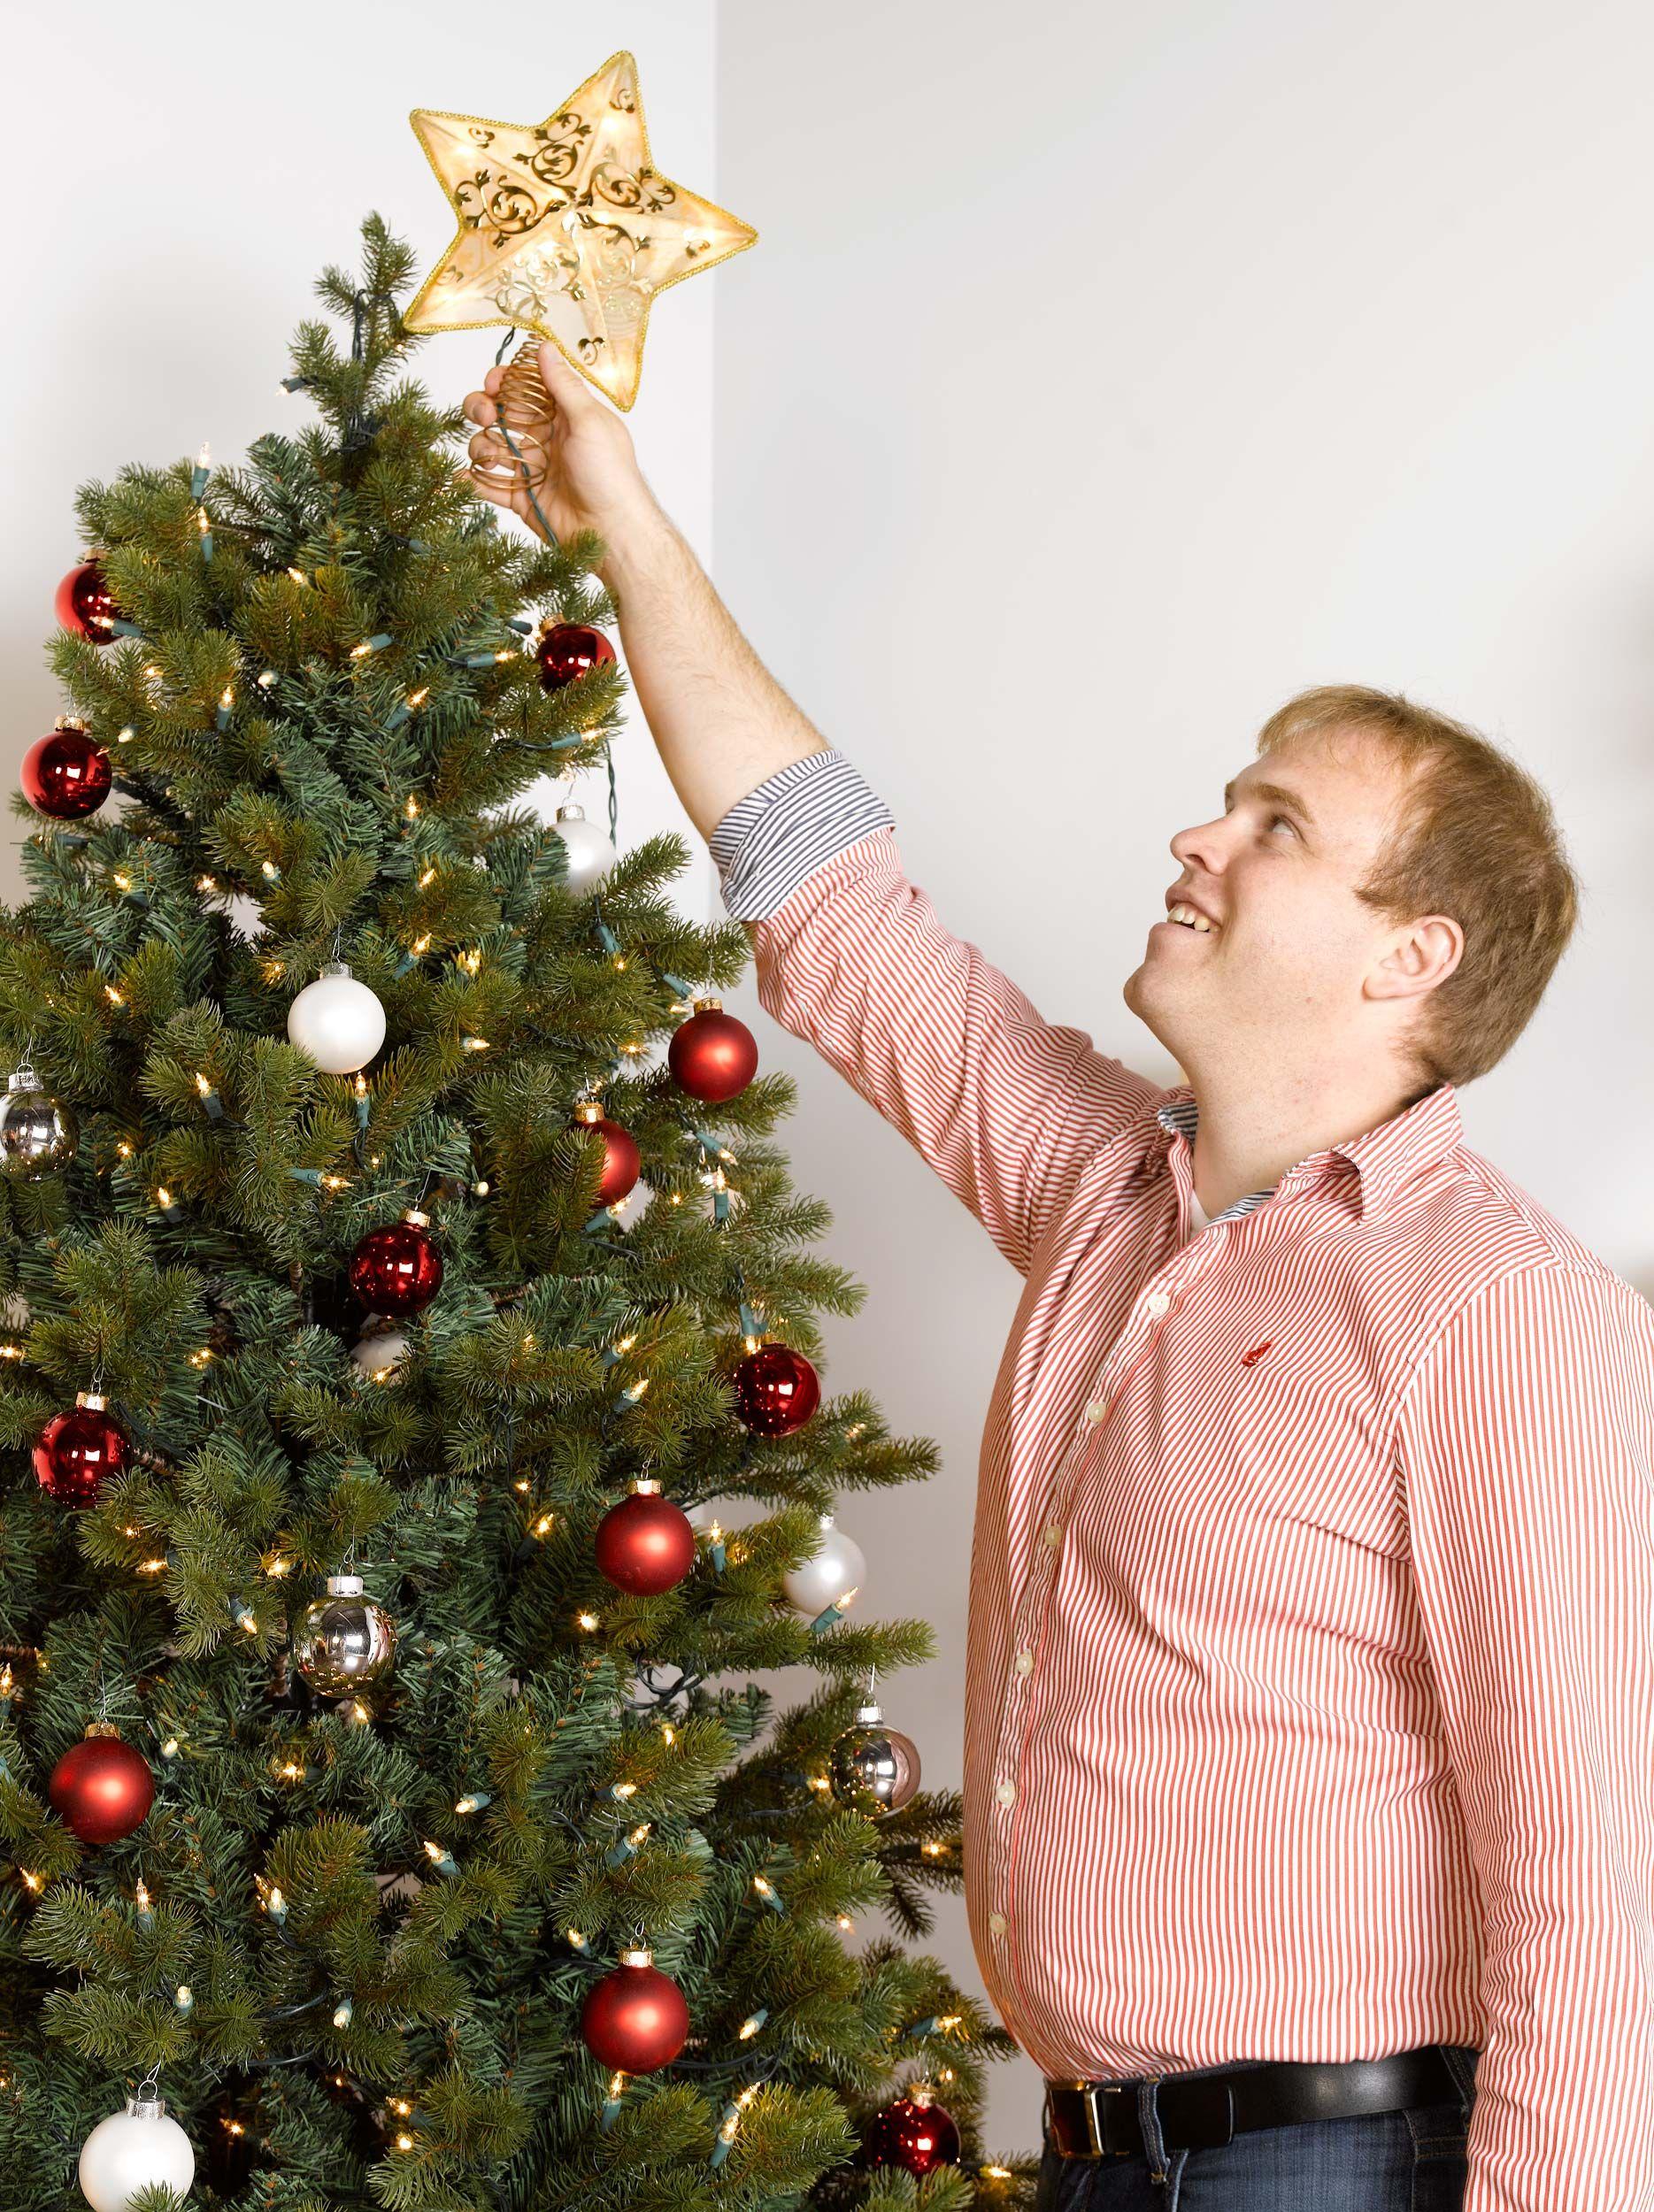 Christmasltd Com Domain Name For Sale Dan Com Unique Tree Toppers Star Tree Topper Tree Toppers